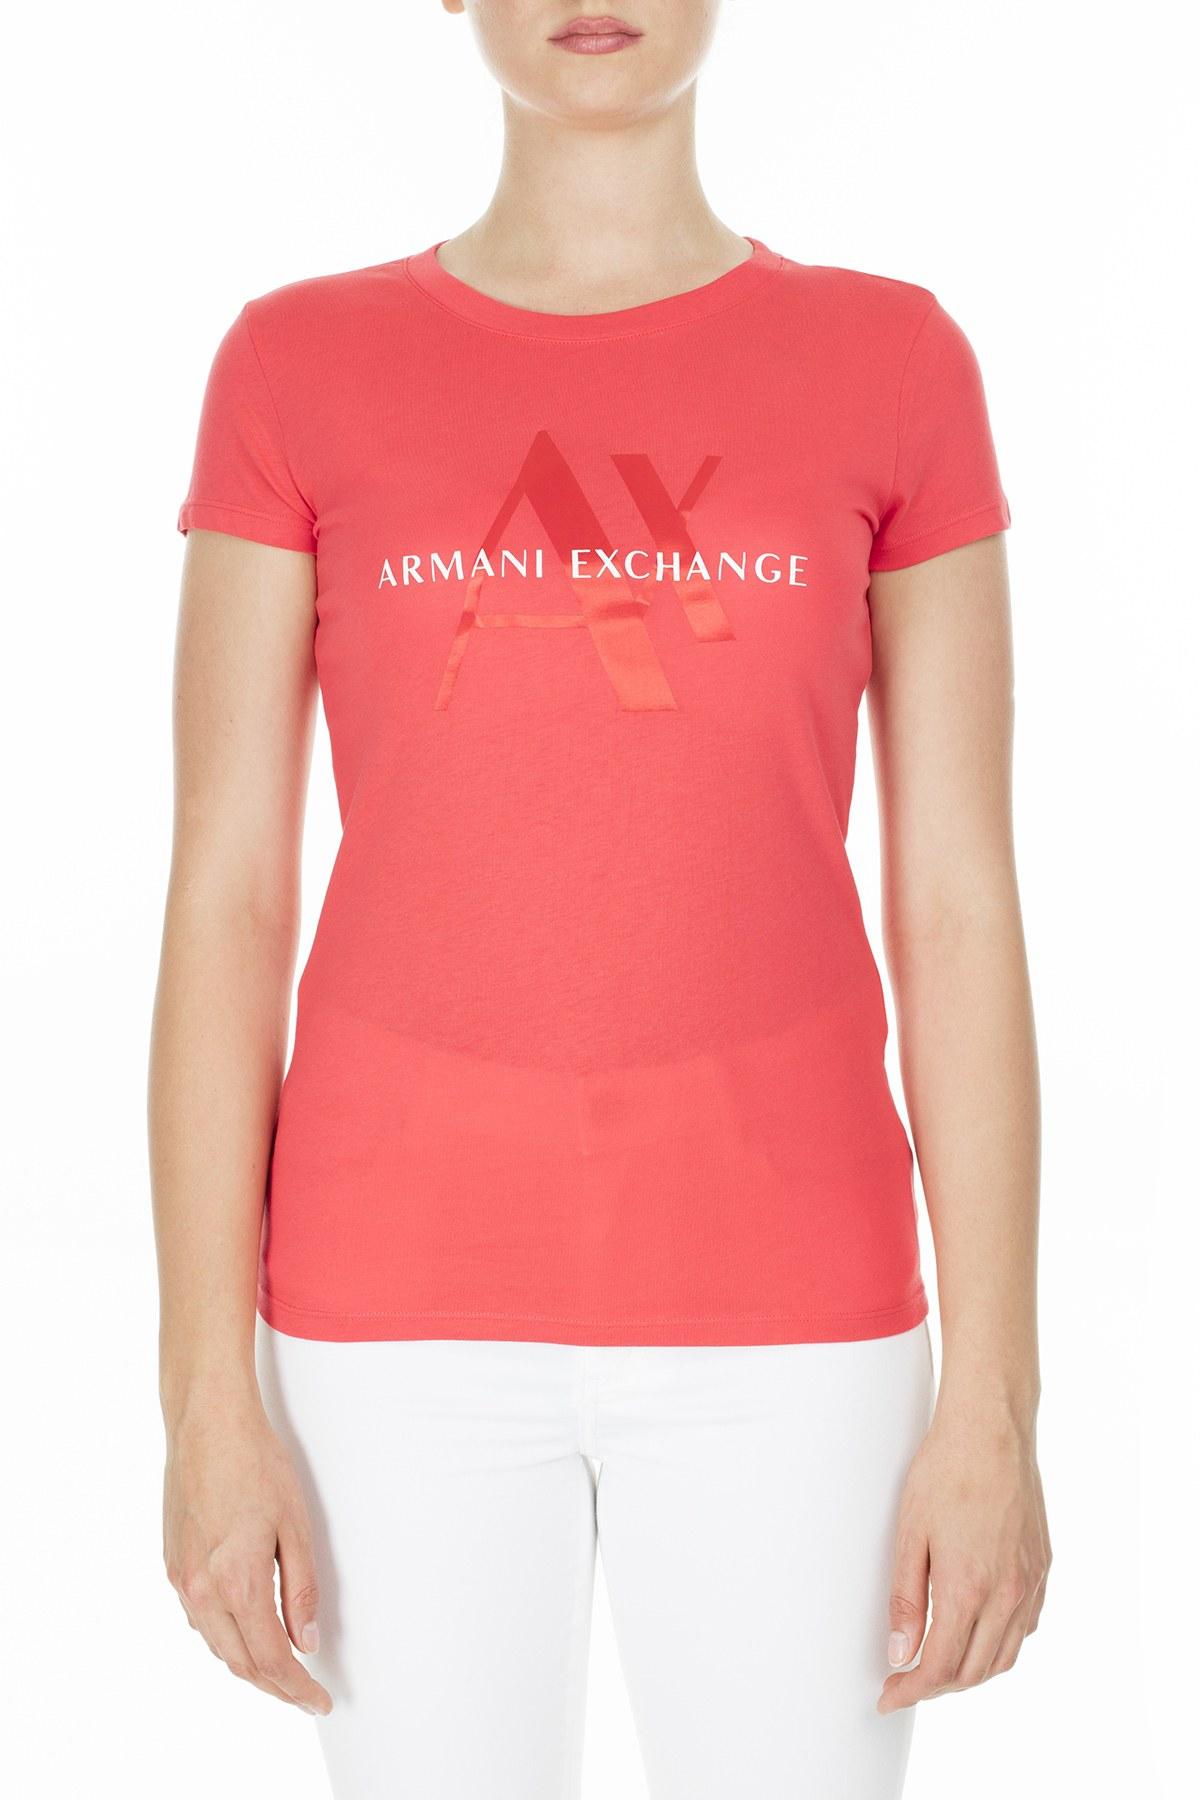 Armani Exchange Kadın T Shirt 3HYTAY YJ73Z 1476 MERCAN